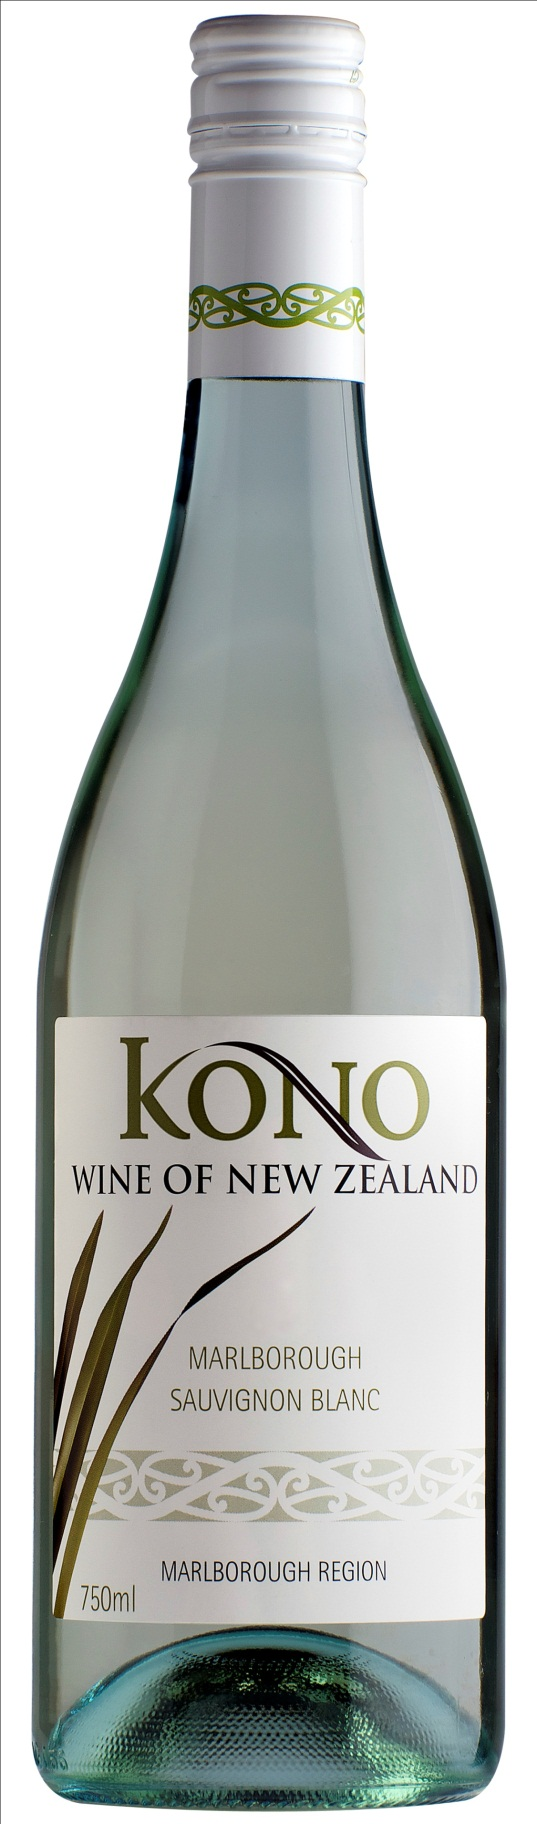 Kono Wine. Got this at Trader Joe's. Loved it!!